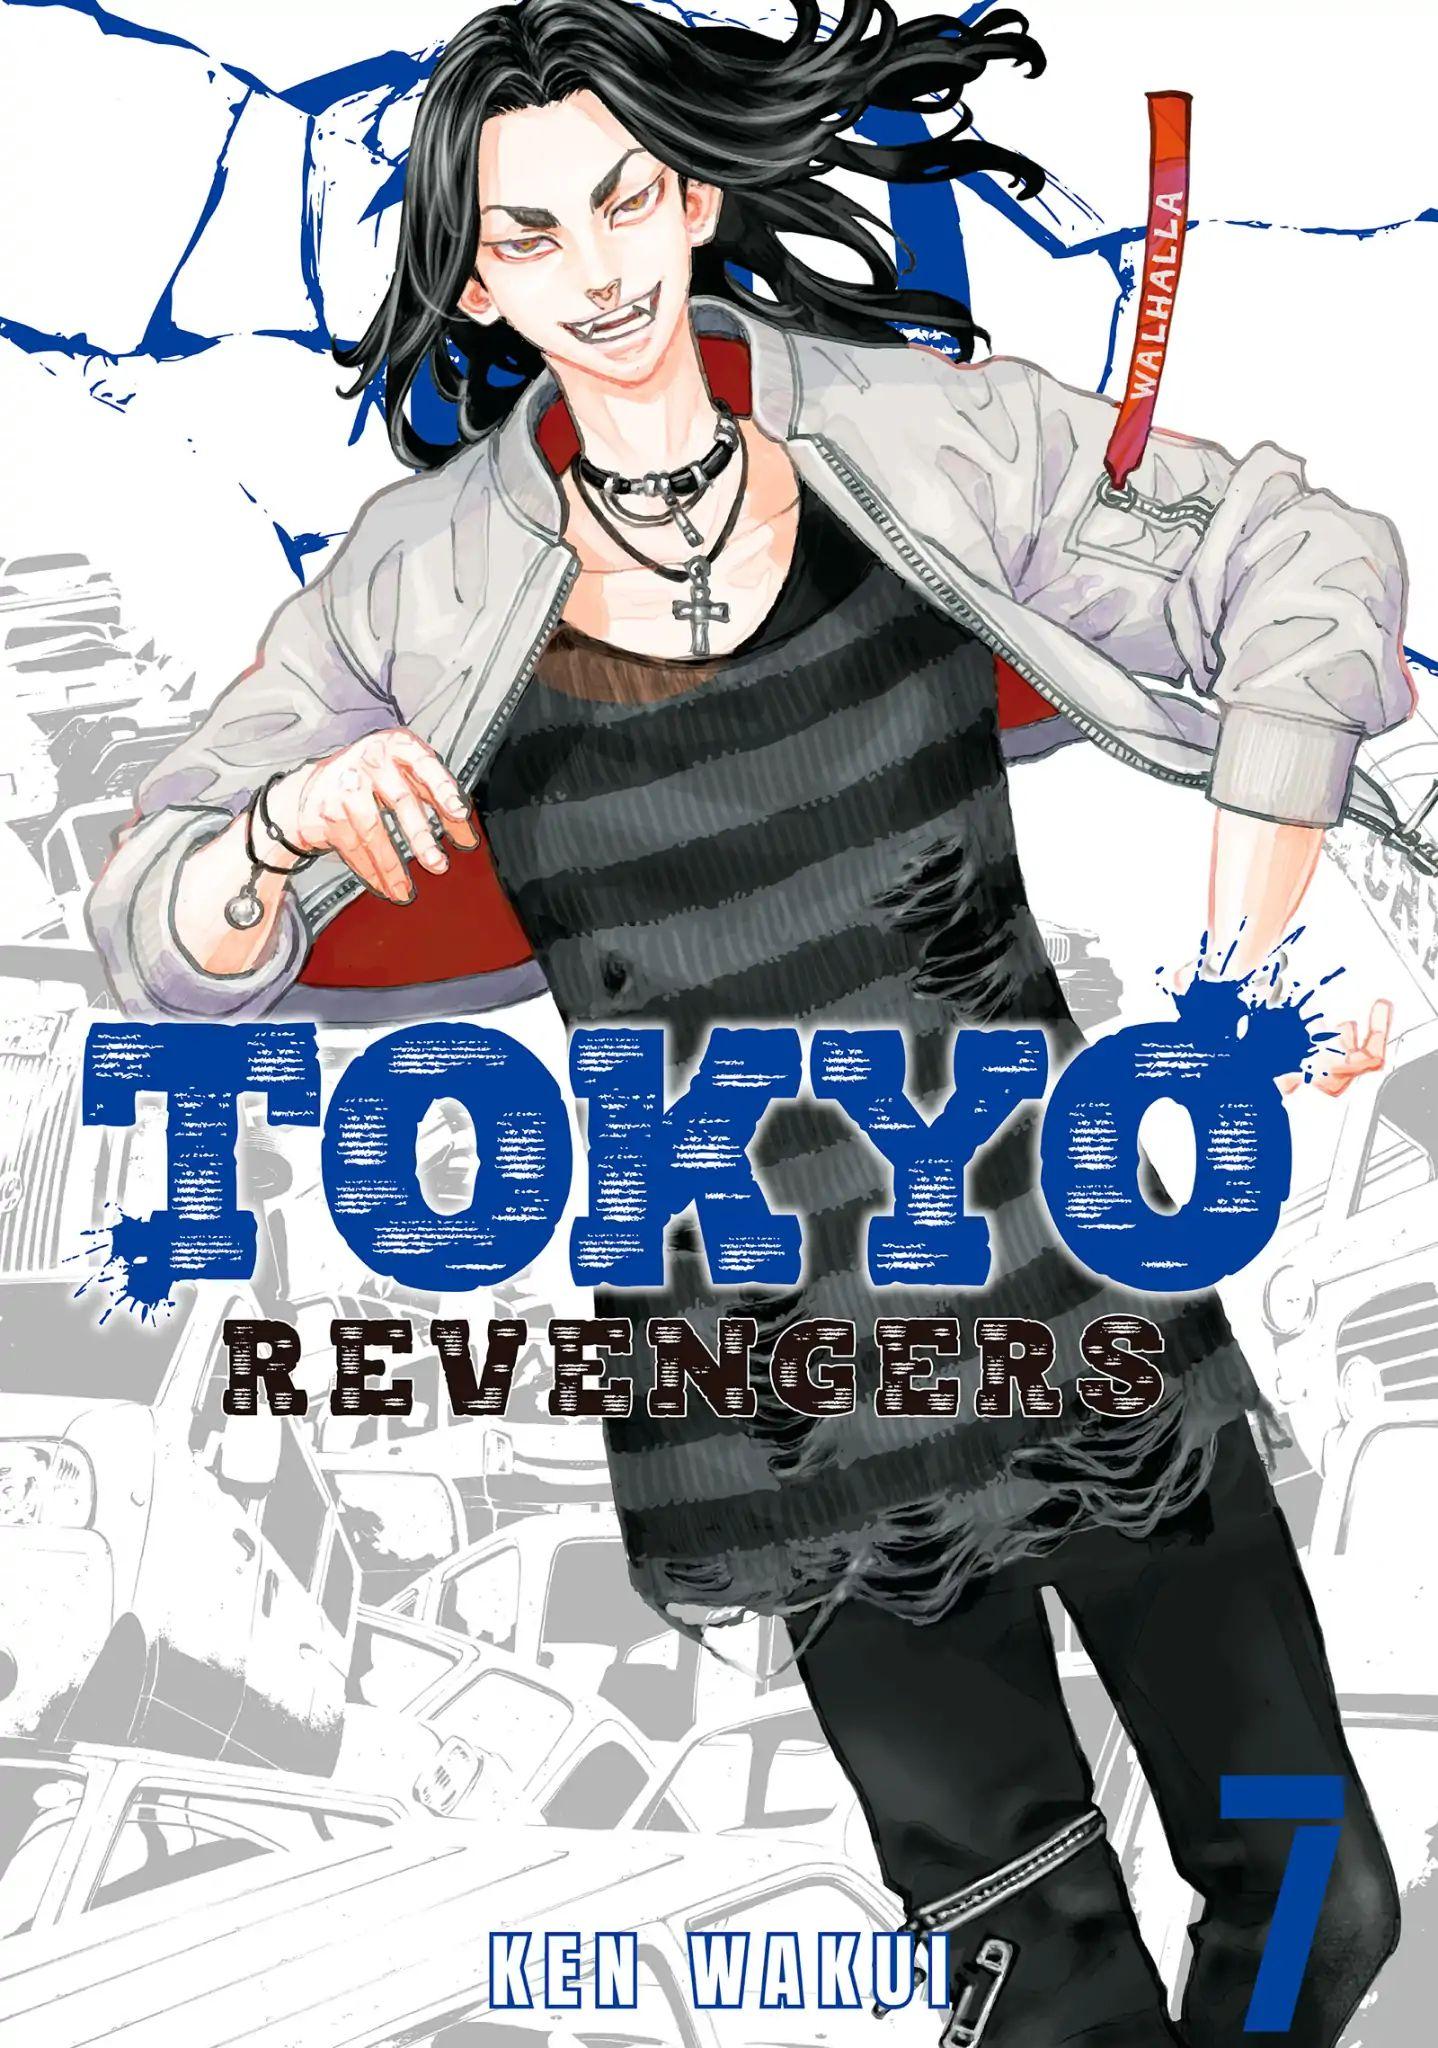 Tokyo revengers manga facts